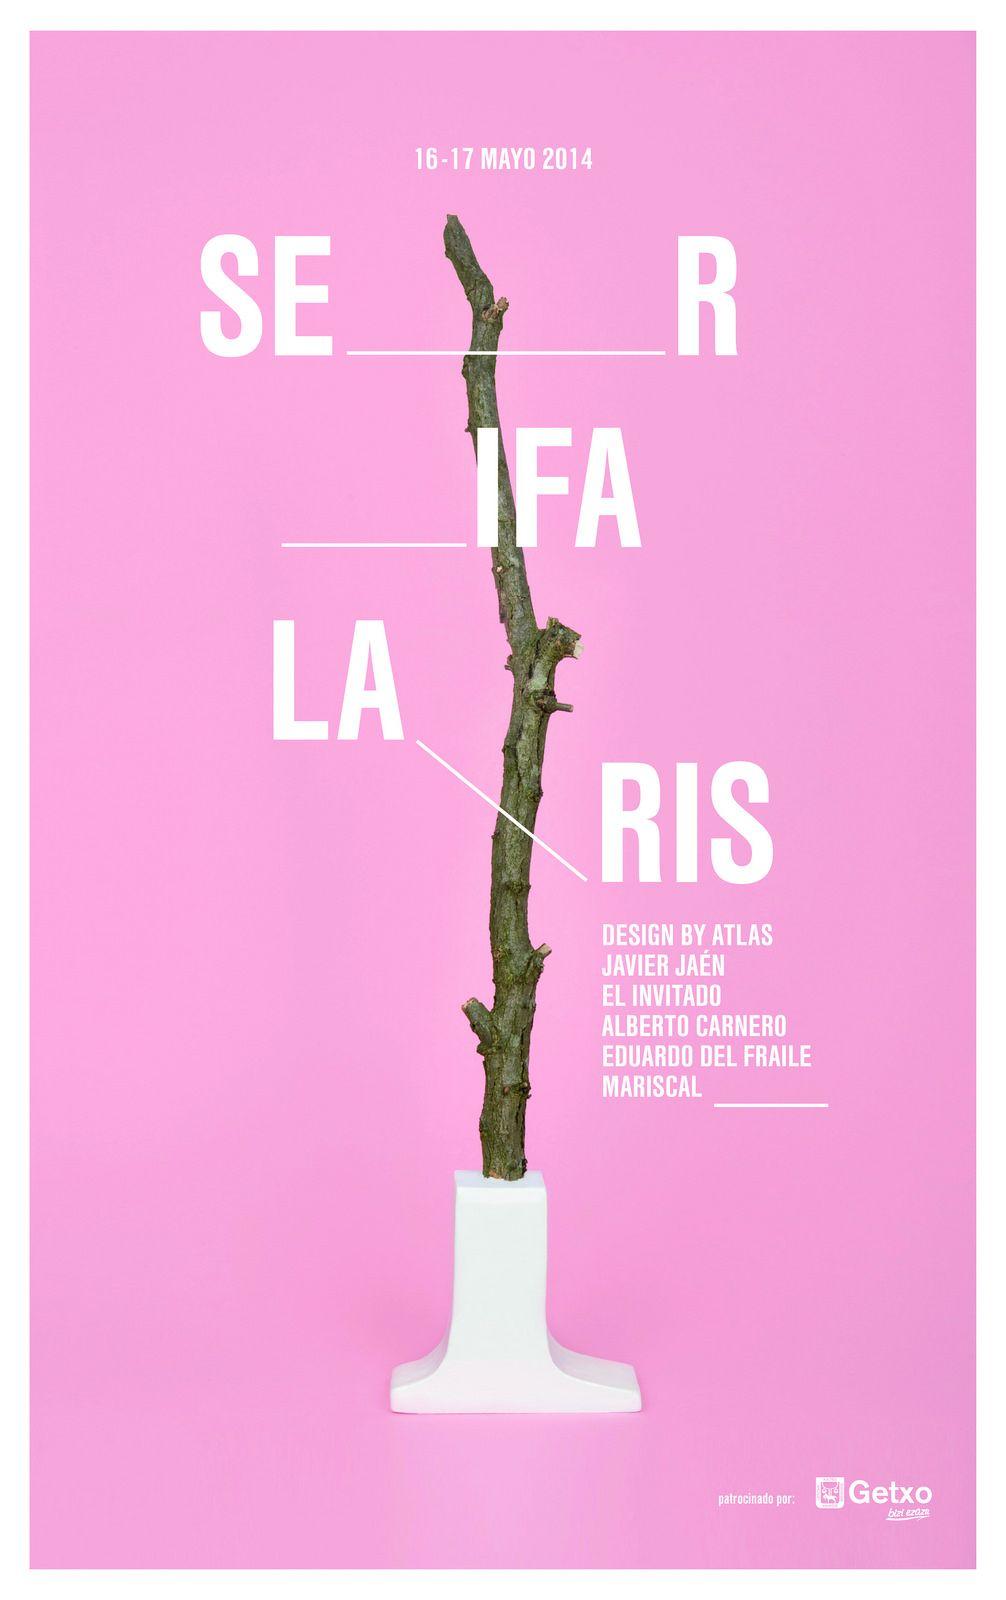 Serifalaris 2014 – Cosas Visuales